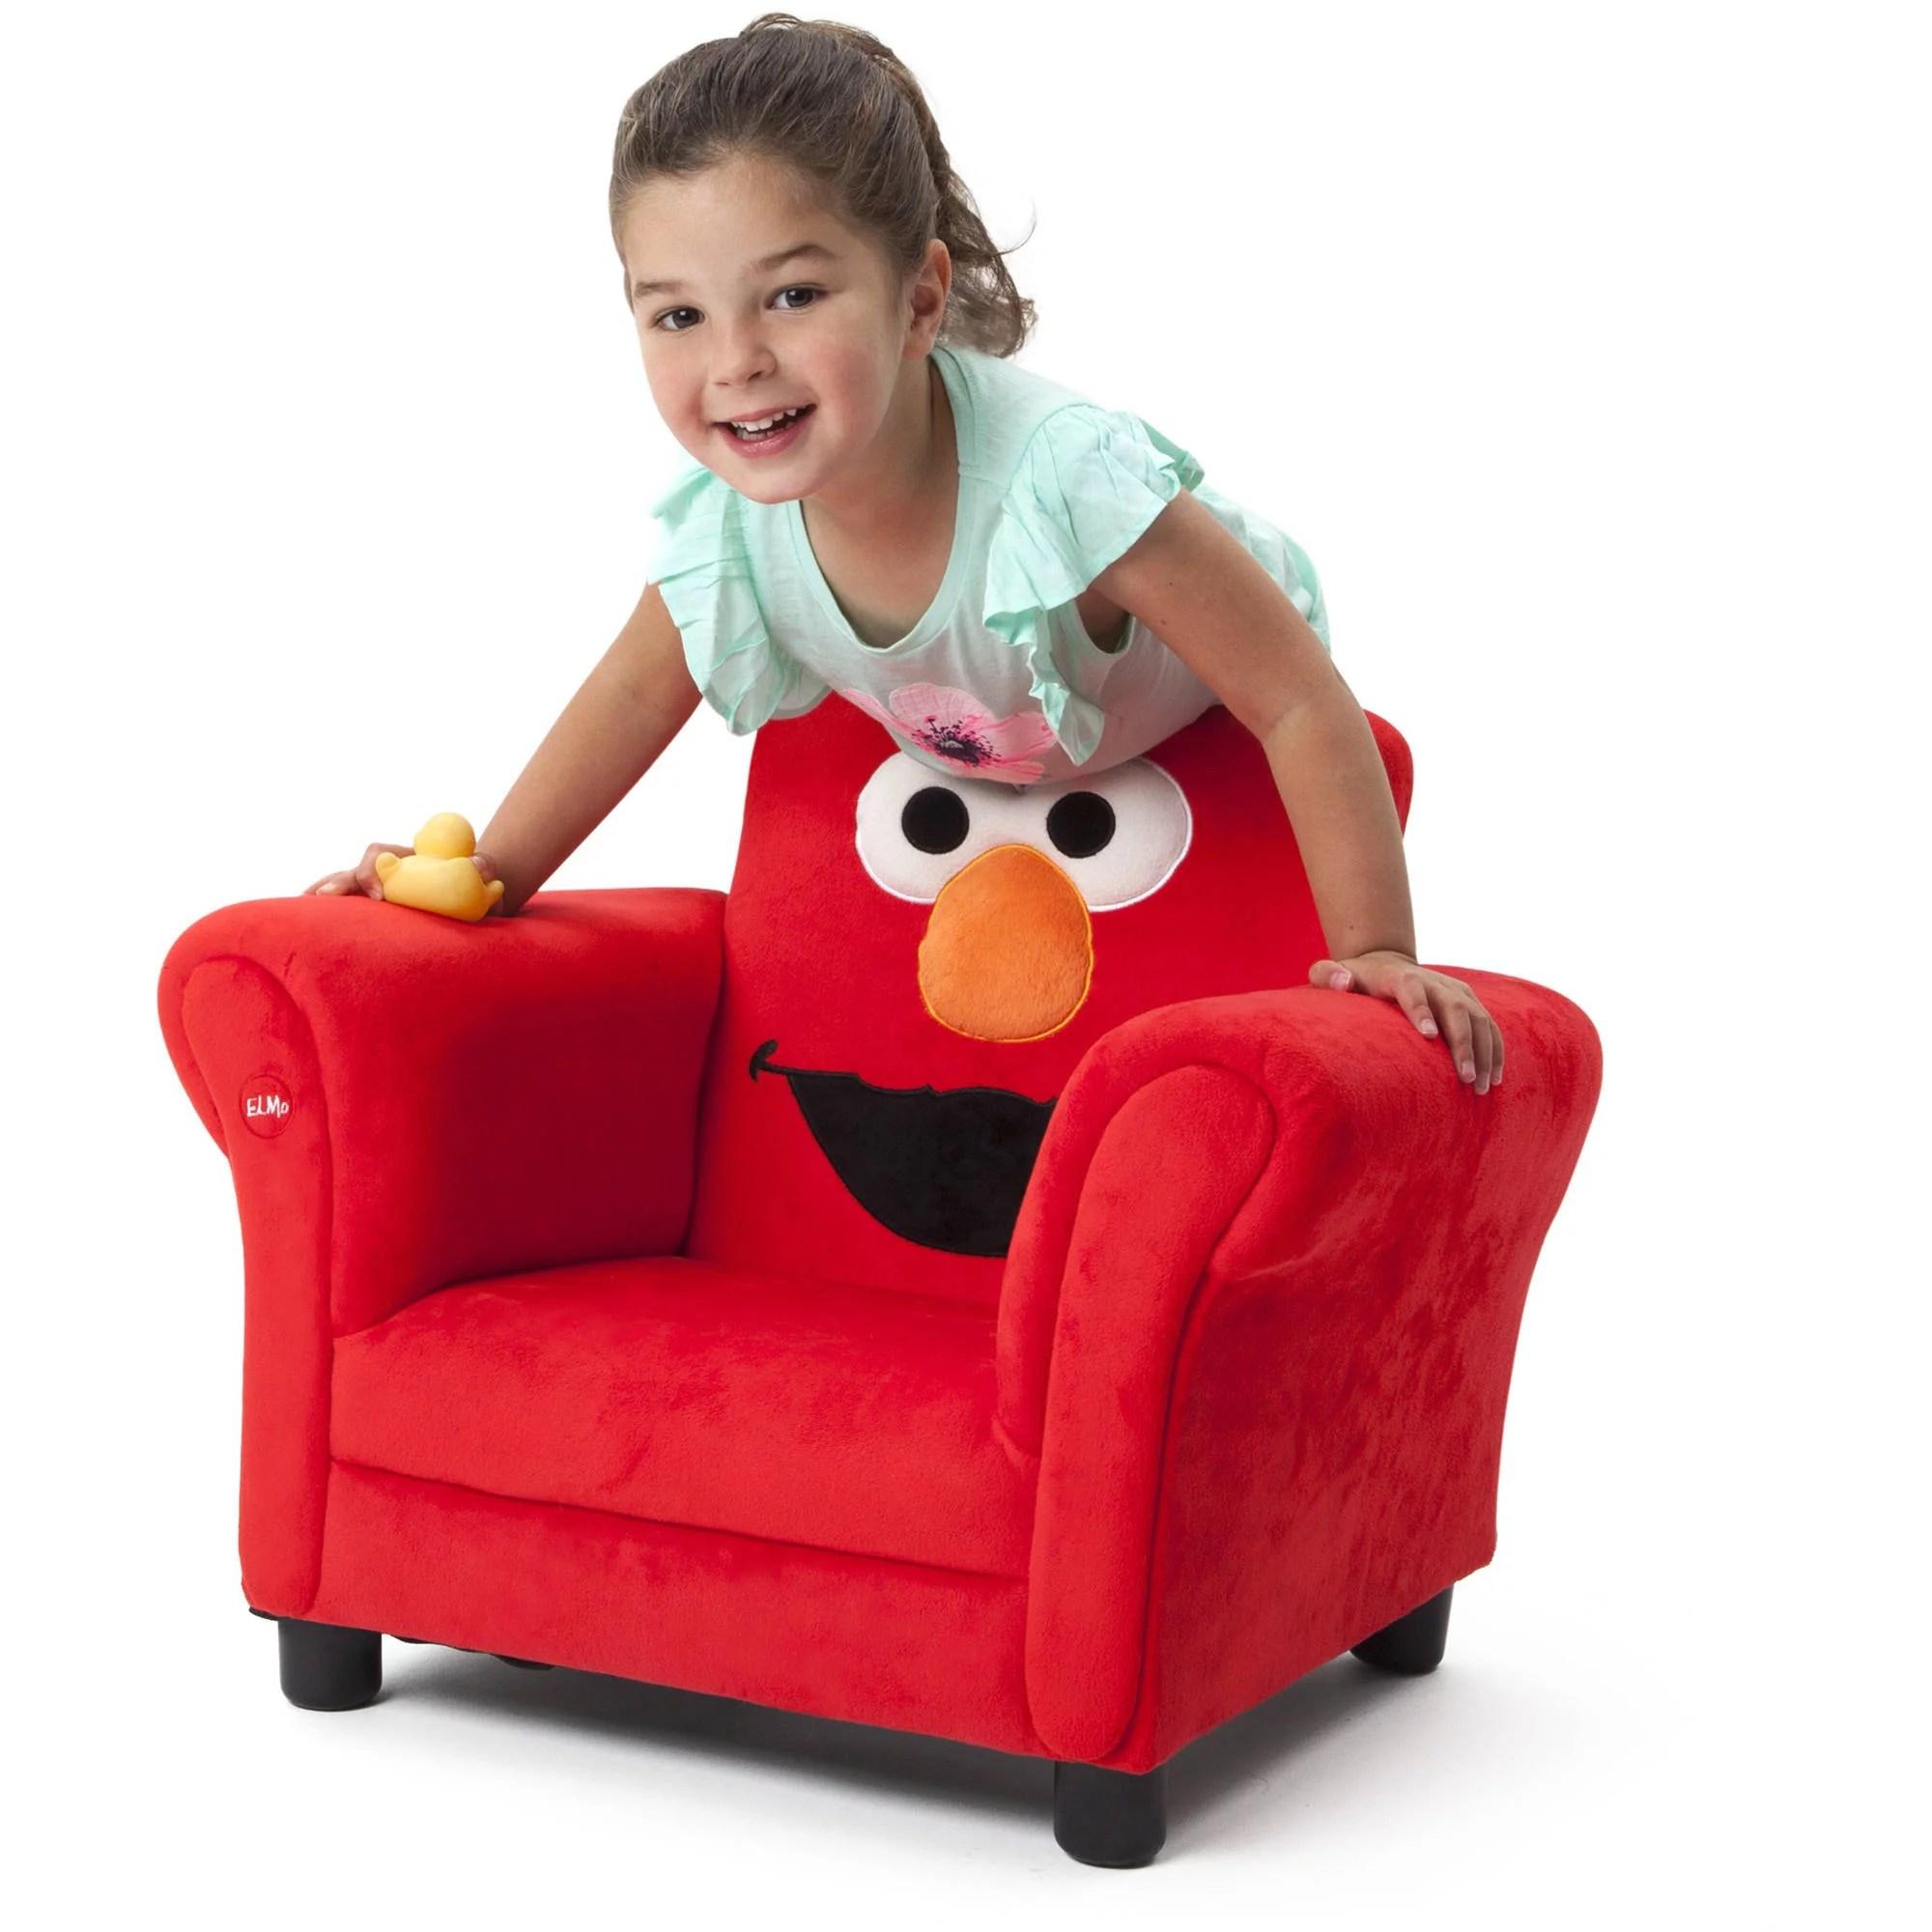 Sesame Street Elmo Upholstered Chair Walmartcom